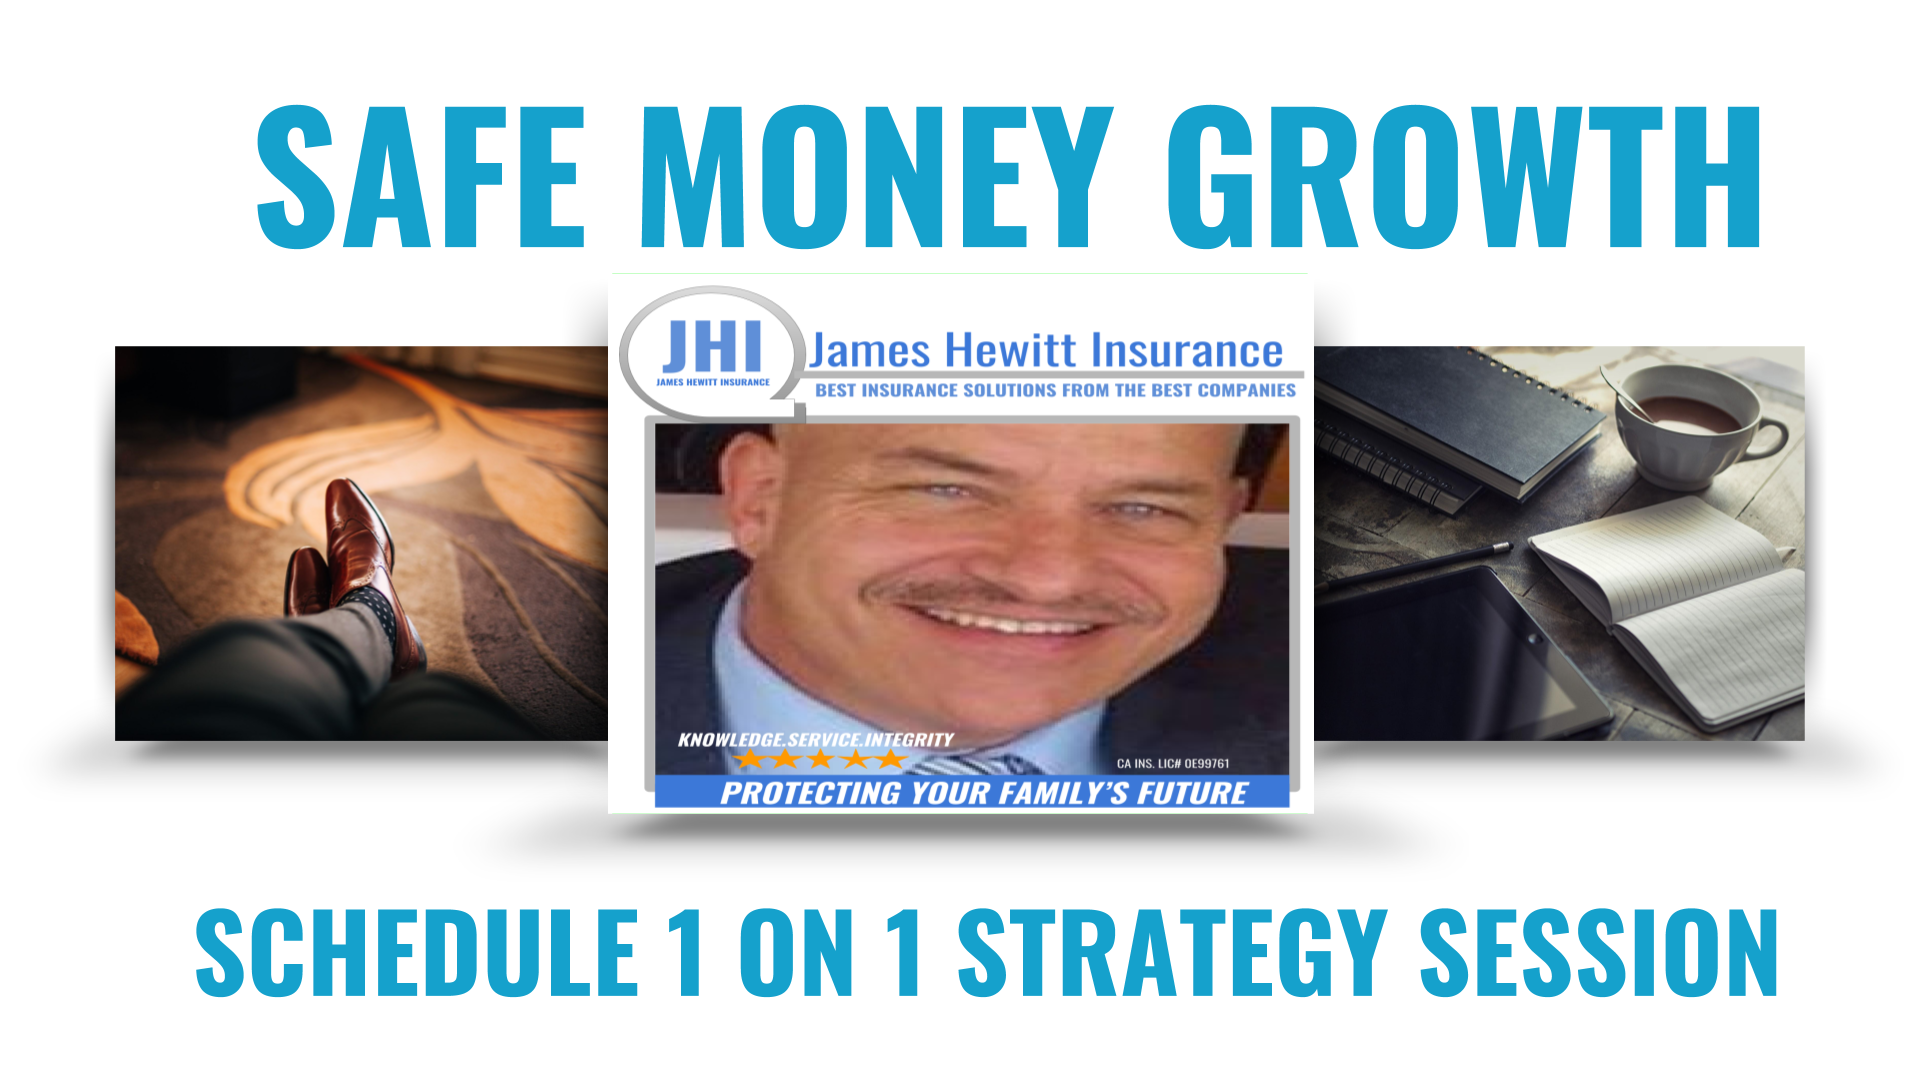 James Hewitt Insurance image 29